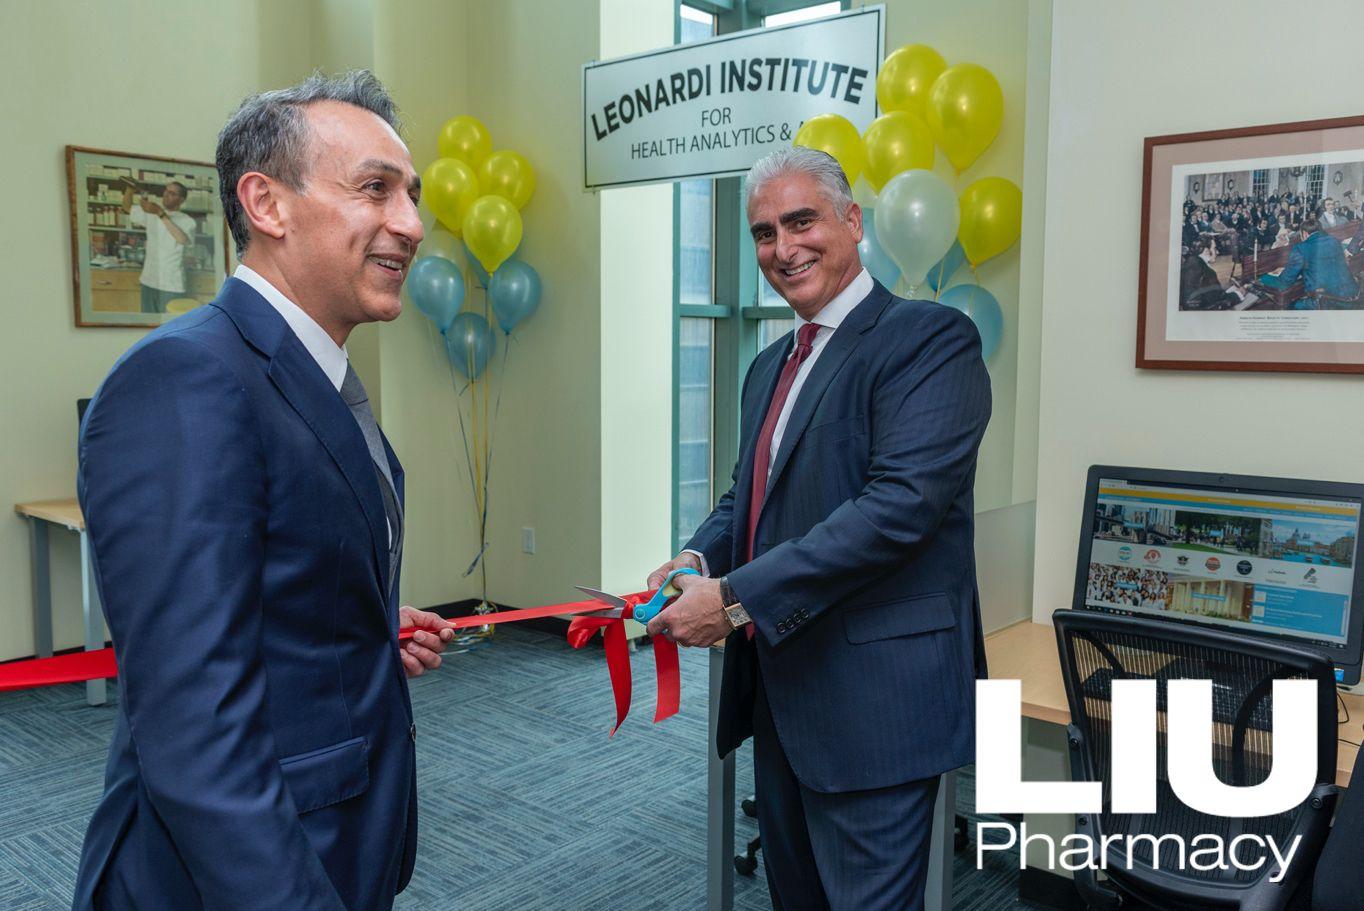 LIU Pharmacy and Agilum Partner to Advance Evidence-Based Care